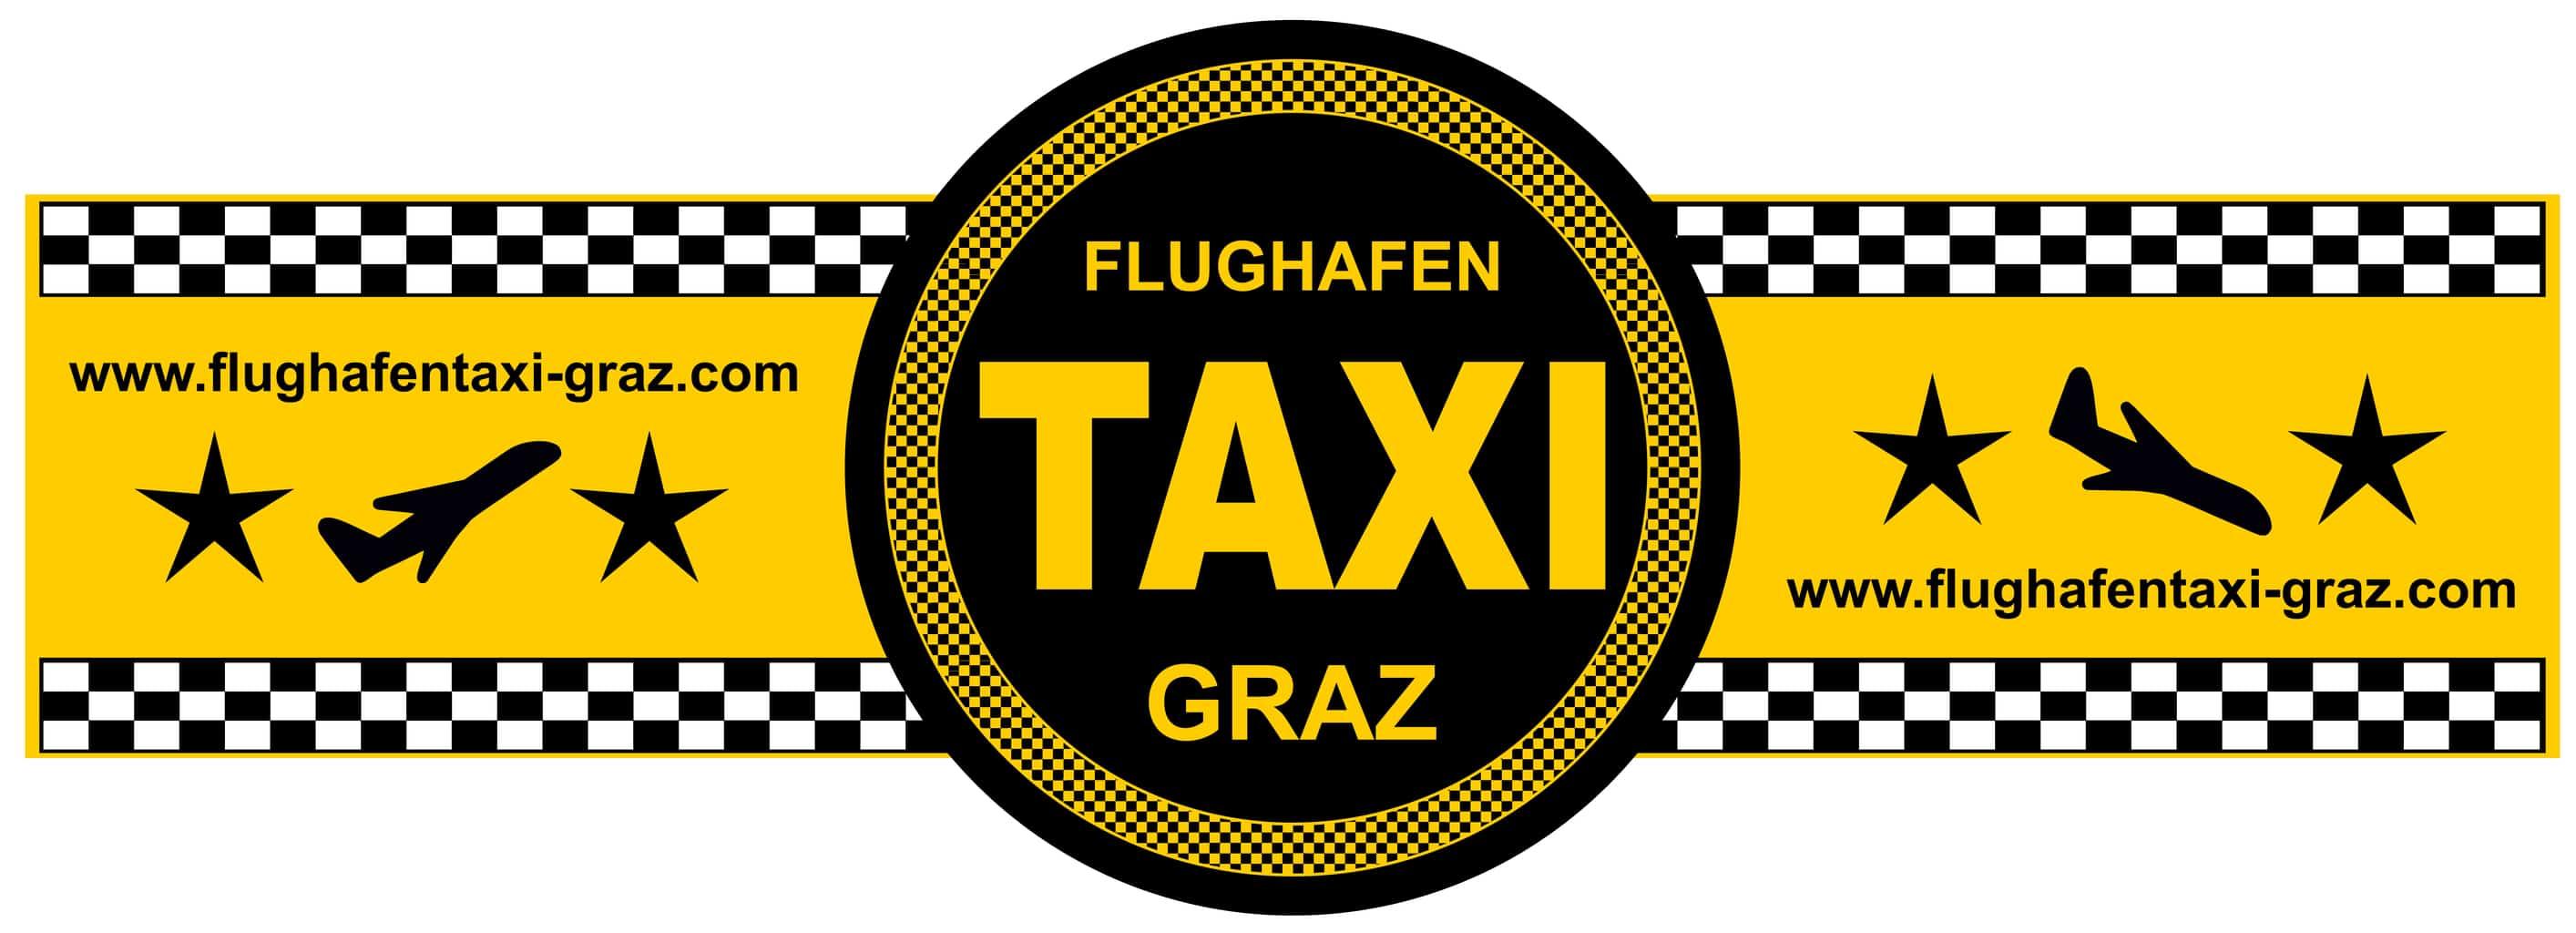 FLUGHAFENTAXI-GRAZ